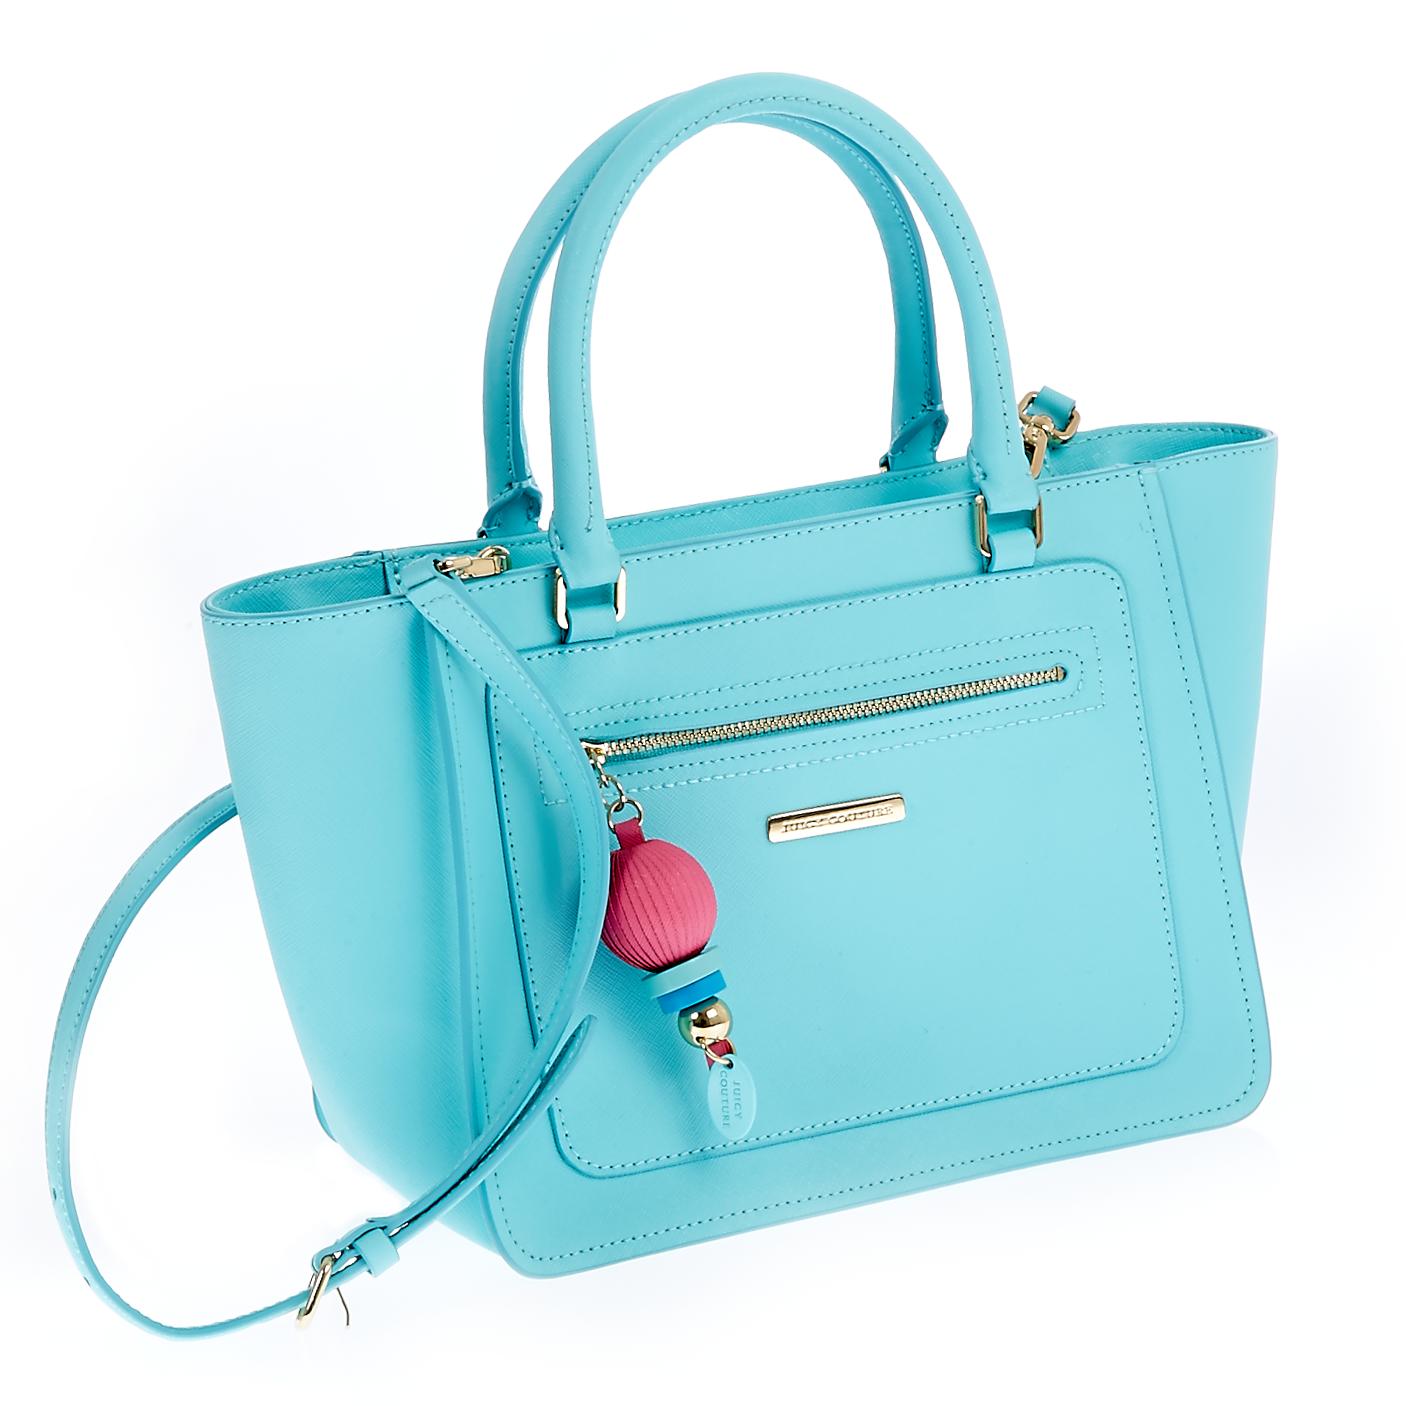 JUICY COUTURE – Γυναικεία τσάντα Juicy Couture μπλε 1441261.0-00T2